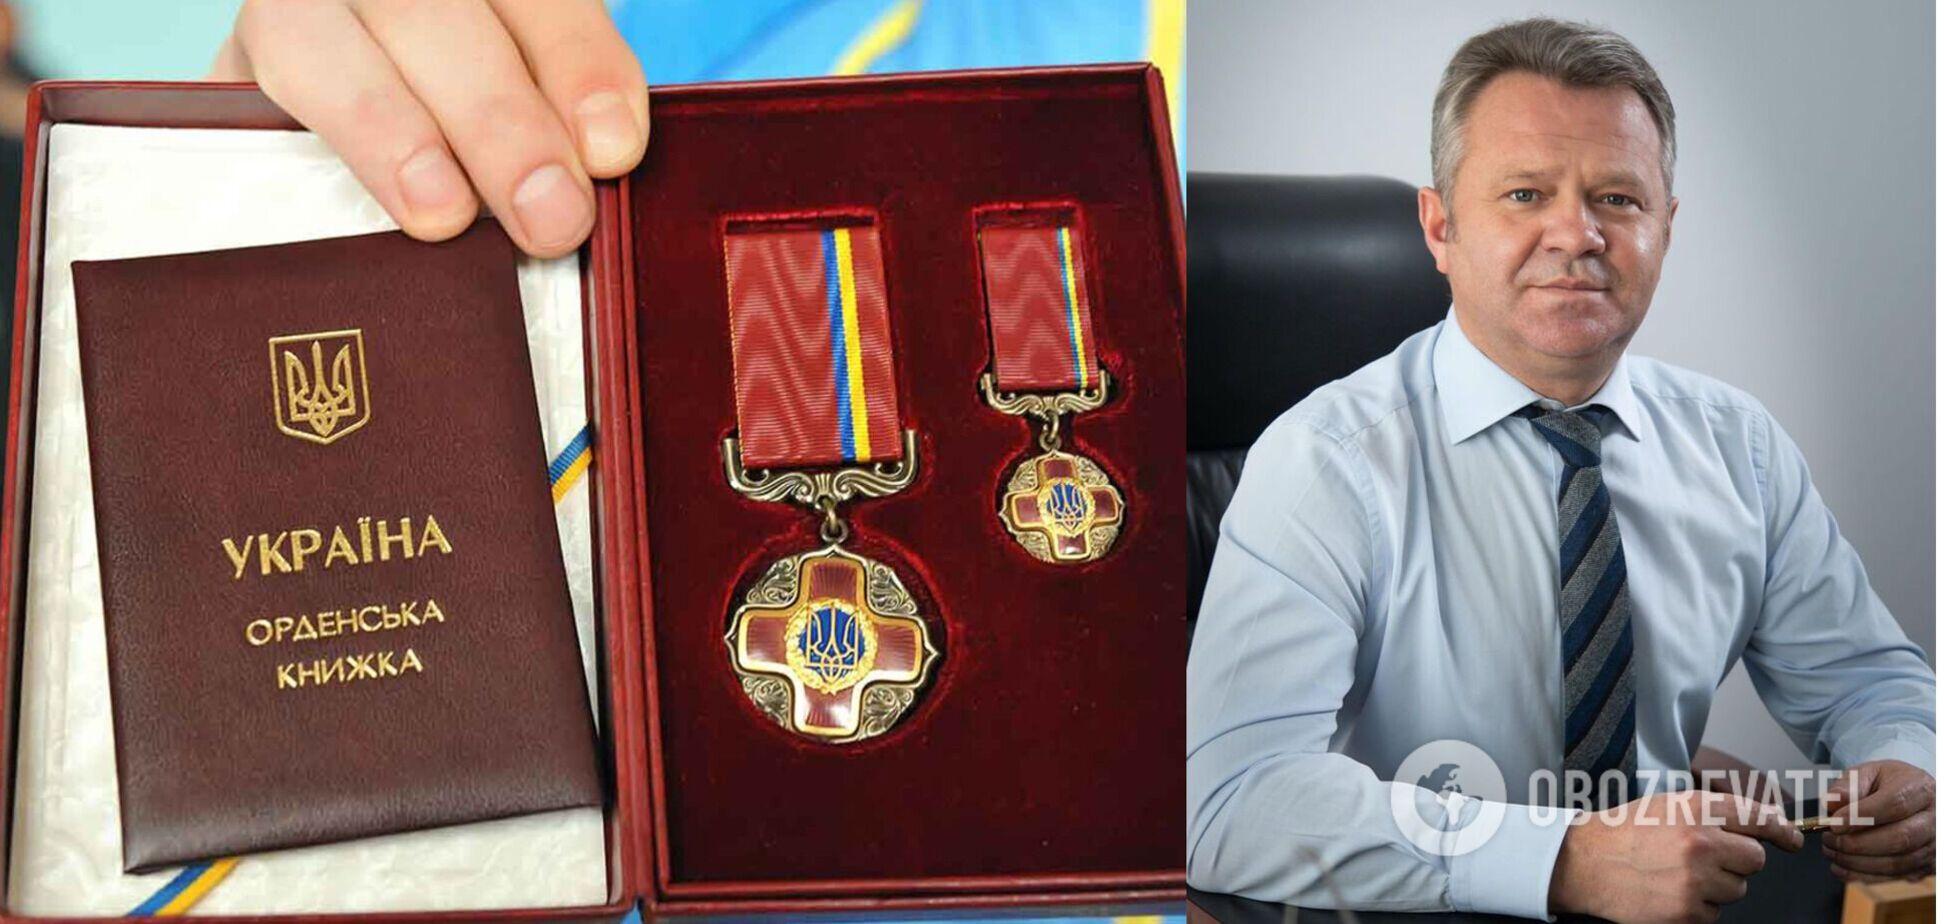 Анатолий Федорук получил орден